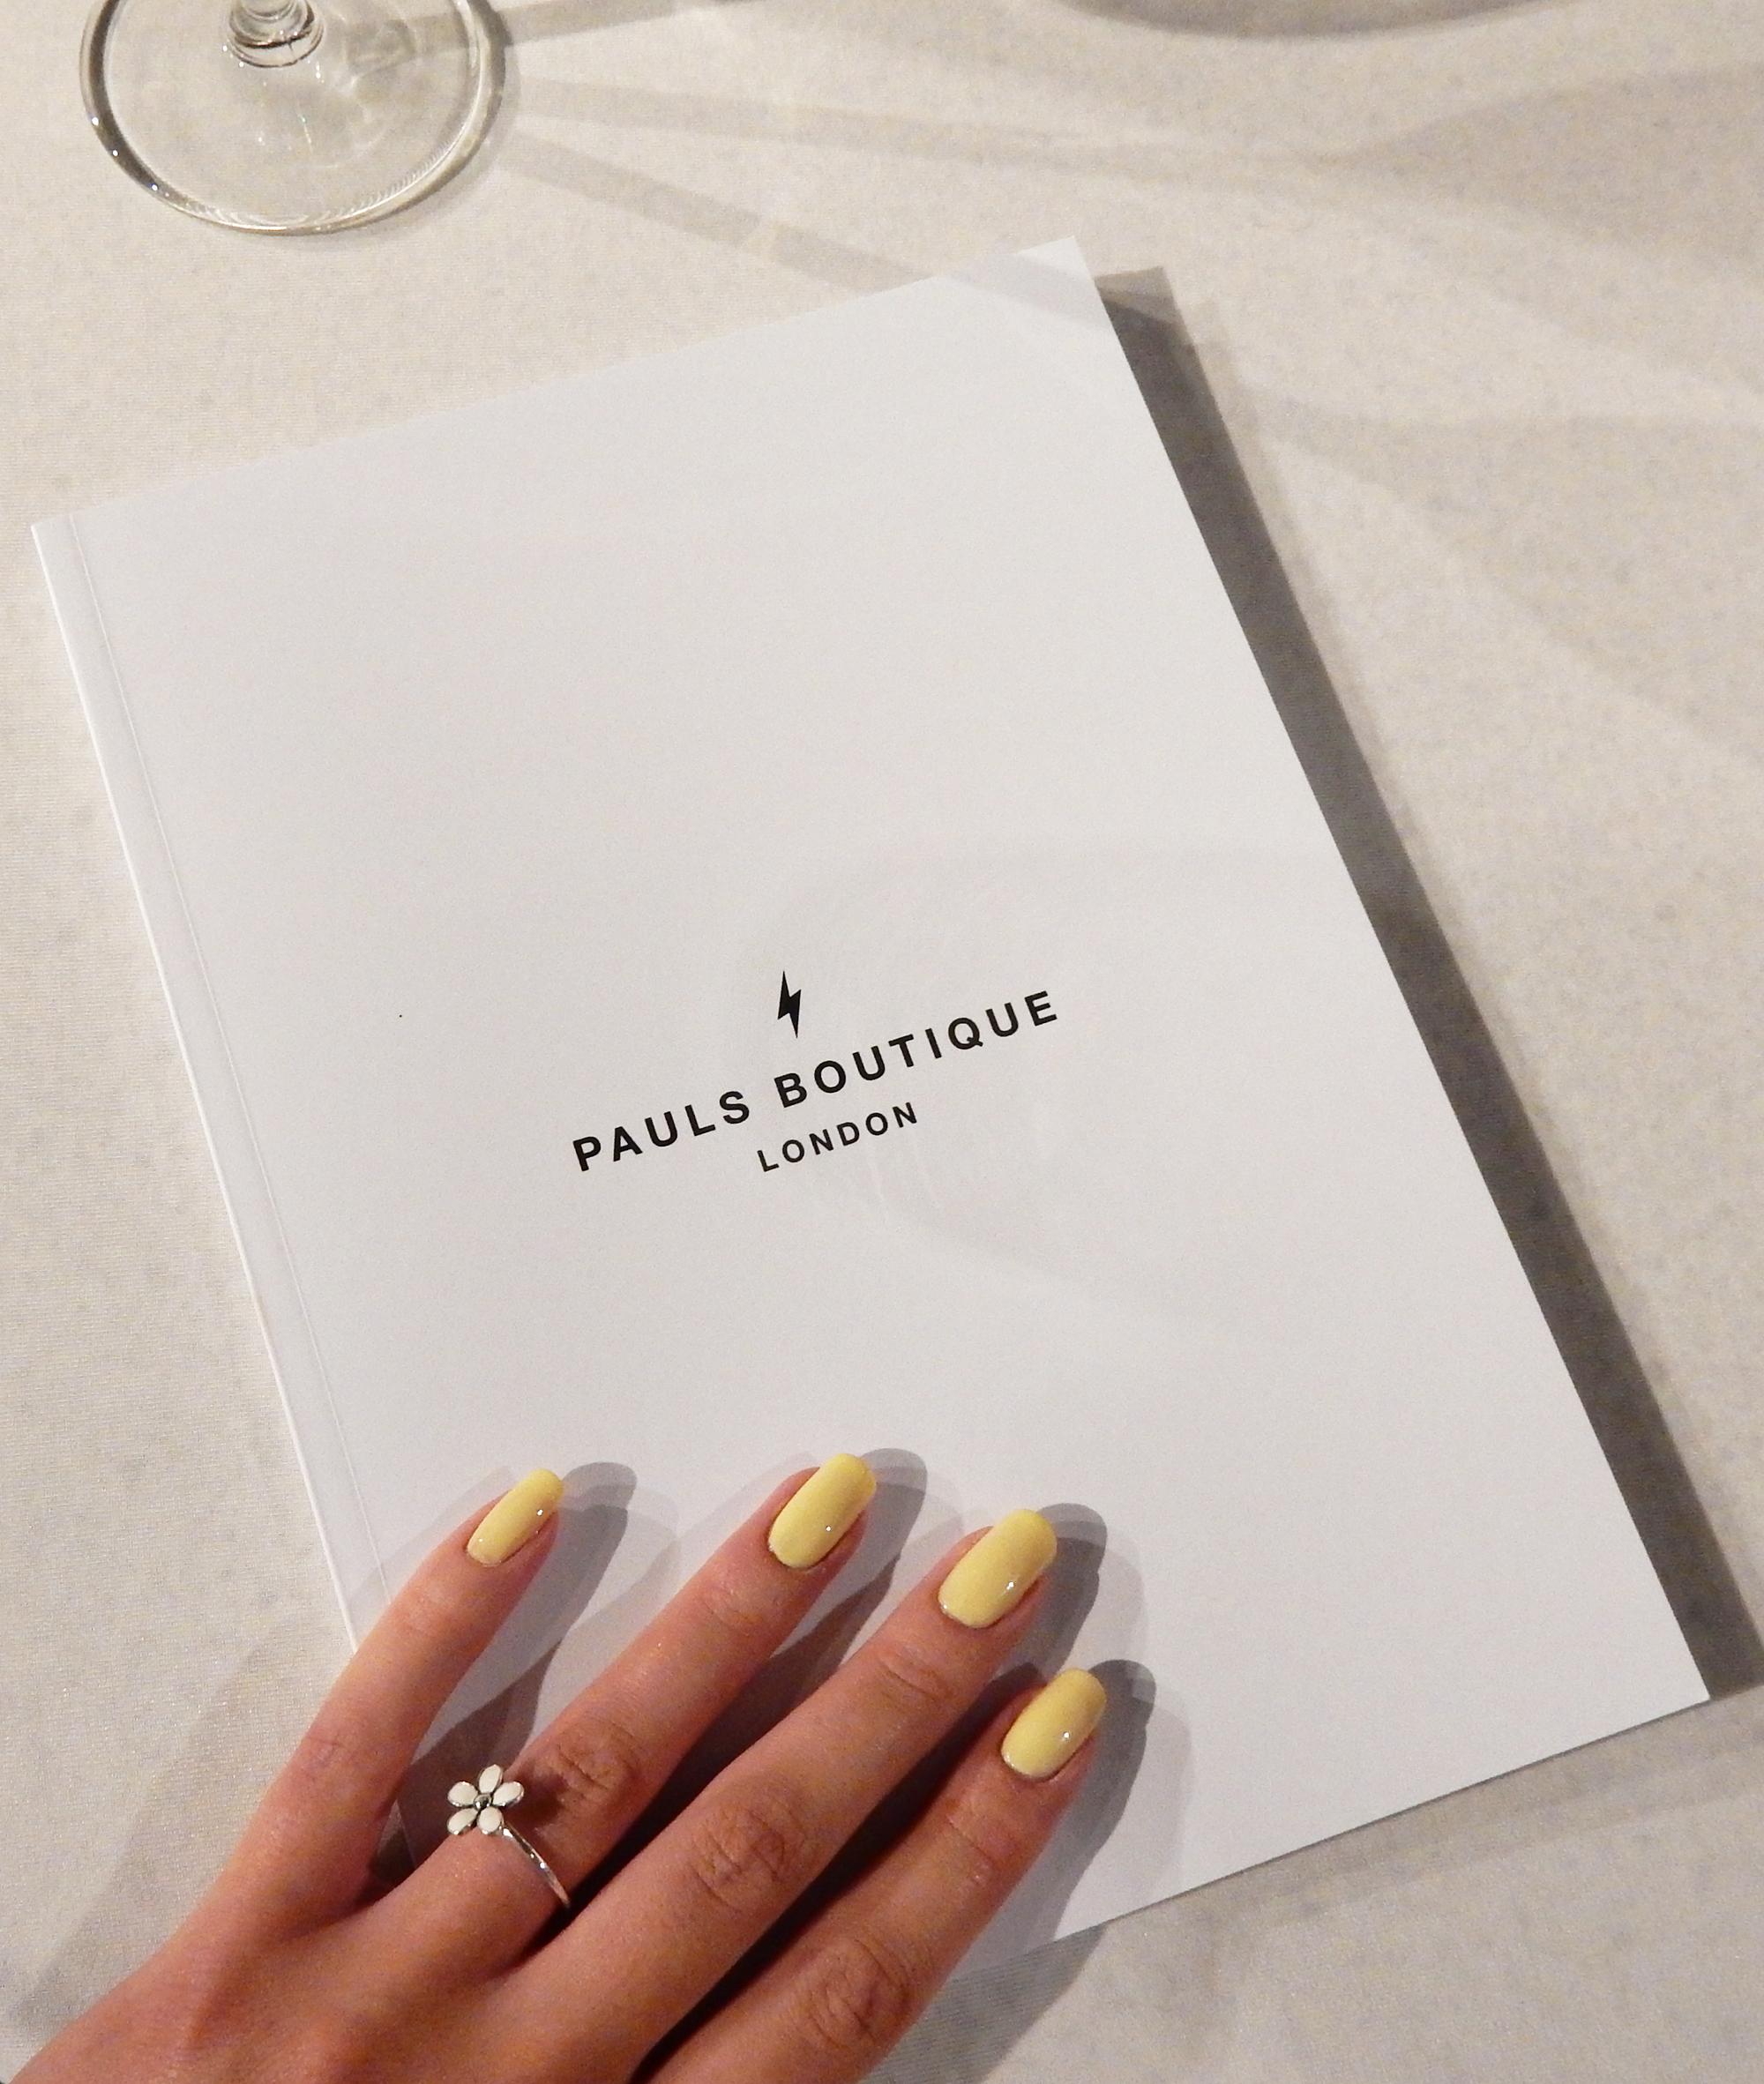 Pauls Boutique London Exclusive Style Blogger Event #PBESBE amsterdam vlog verslag lifestyle by linda fashion mode tassen